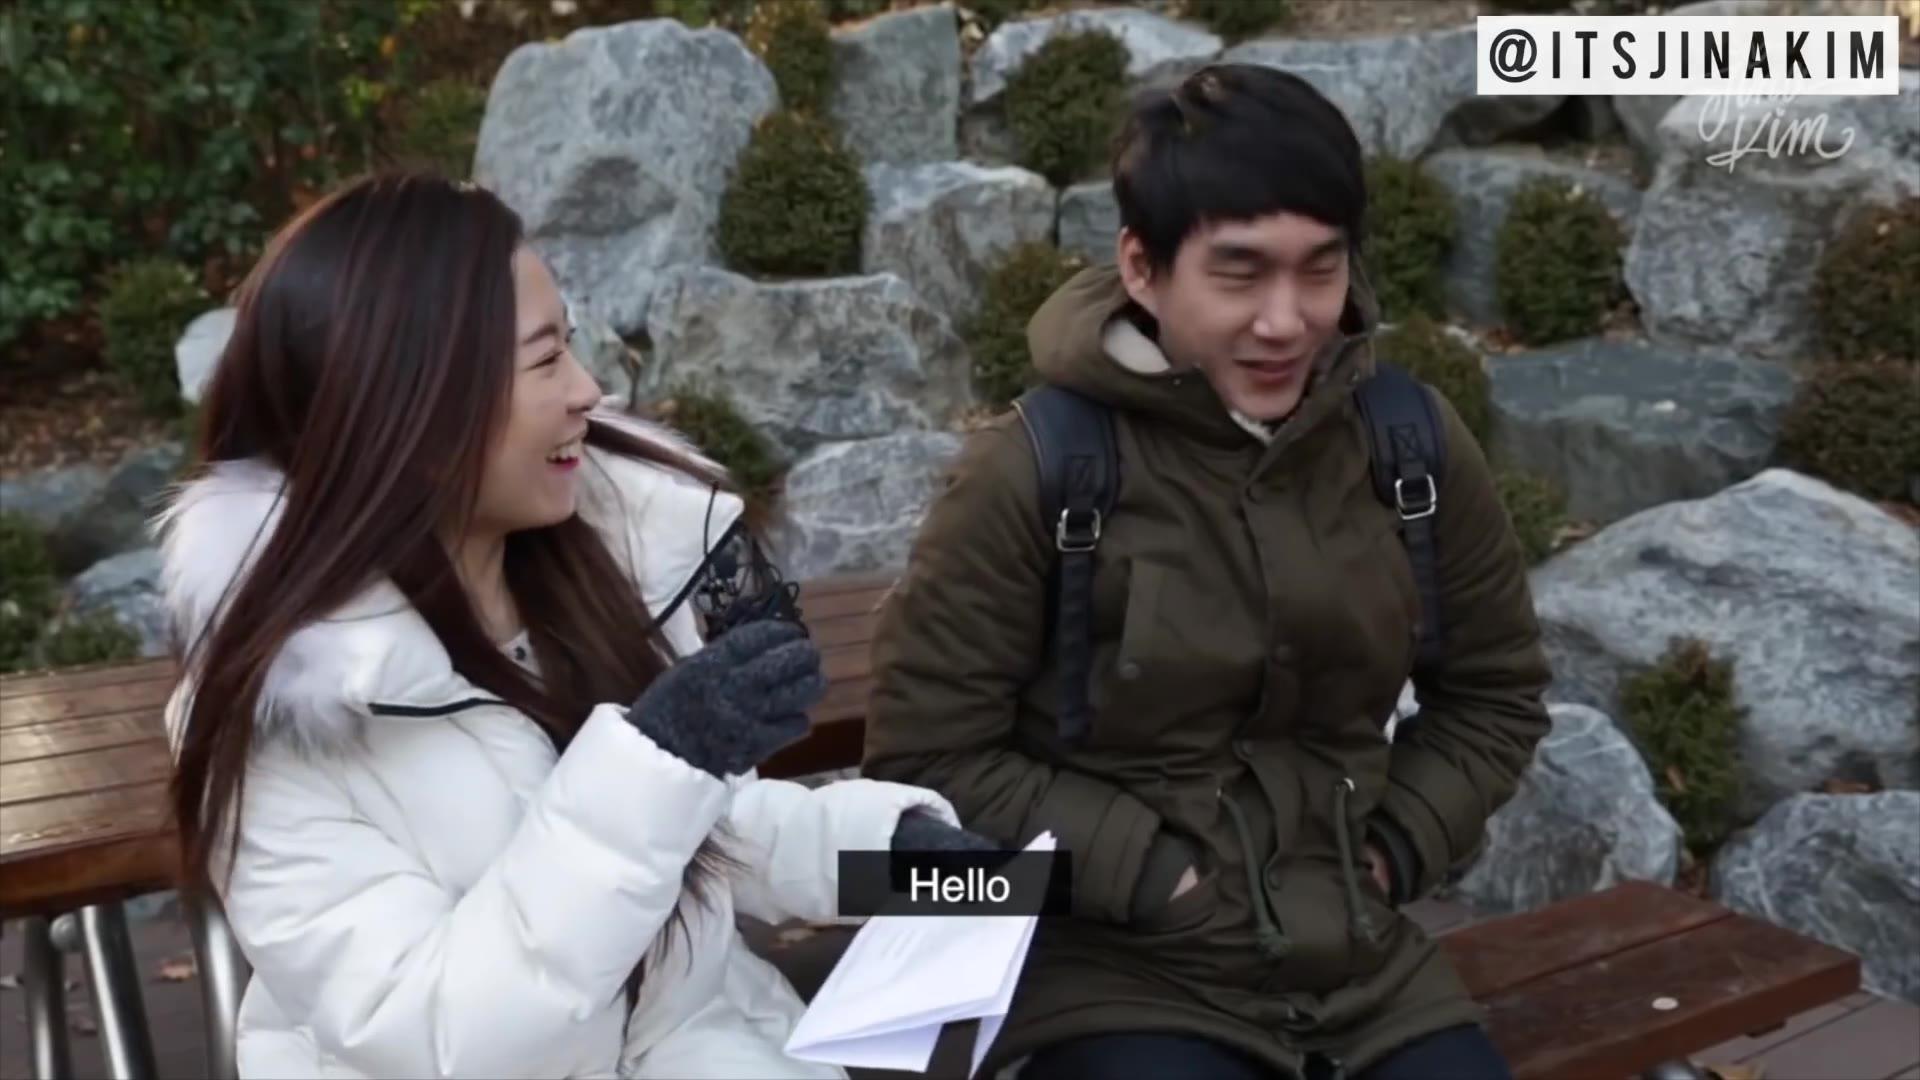 itsjinakim Episode 13: Ask Koreans: Is Kendall Jenner Beautiful?